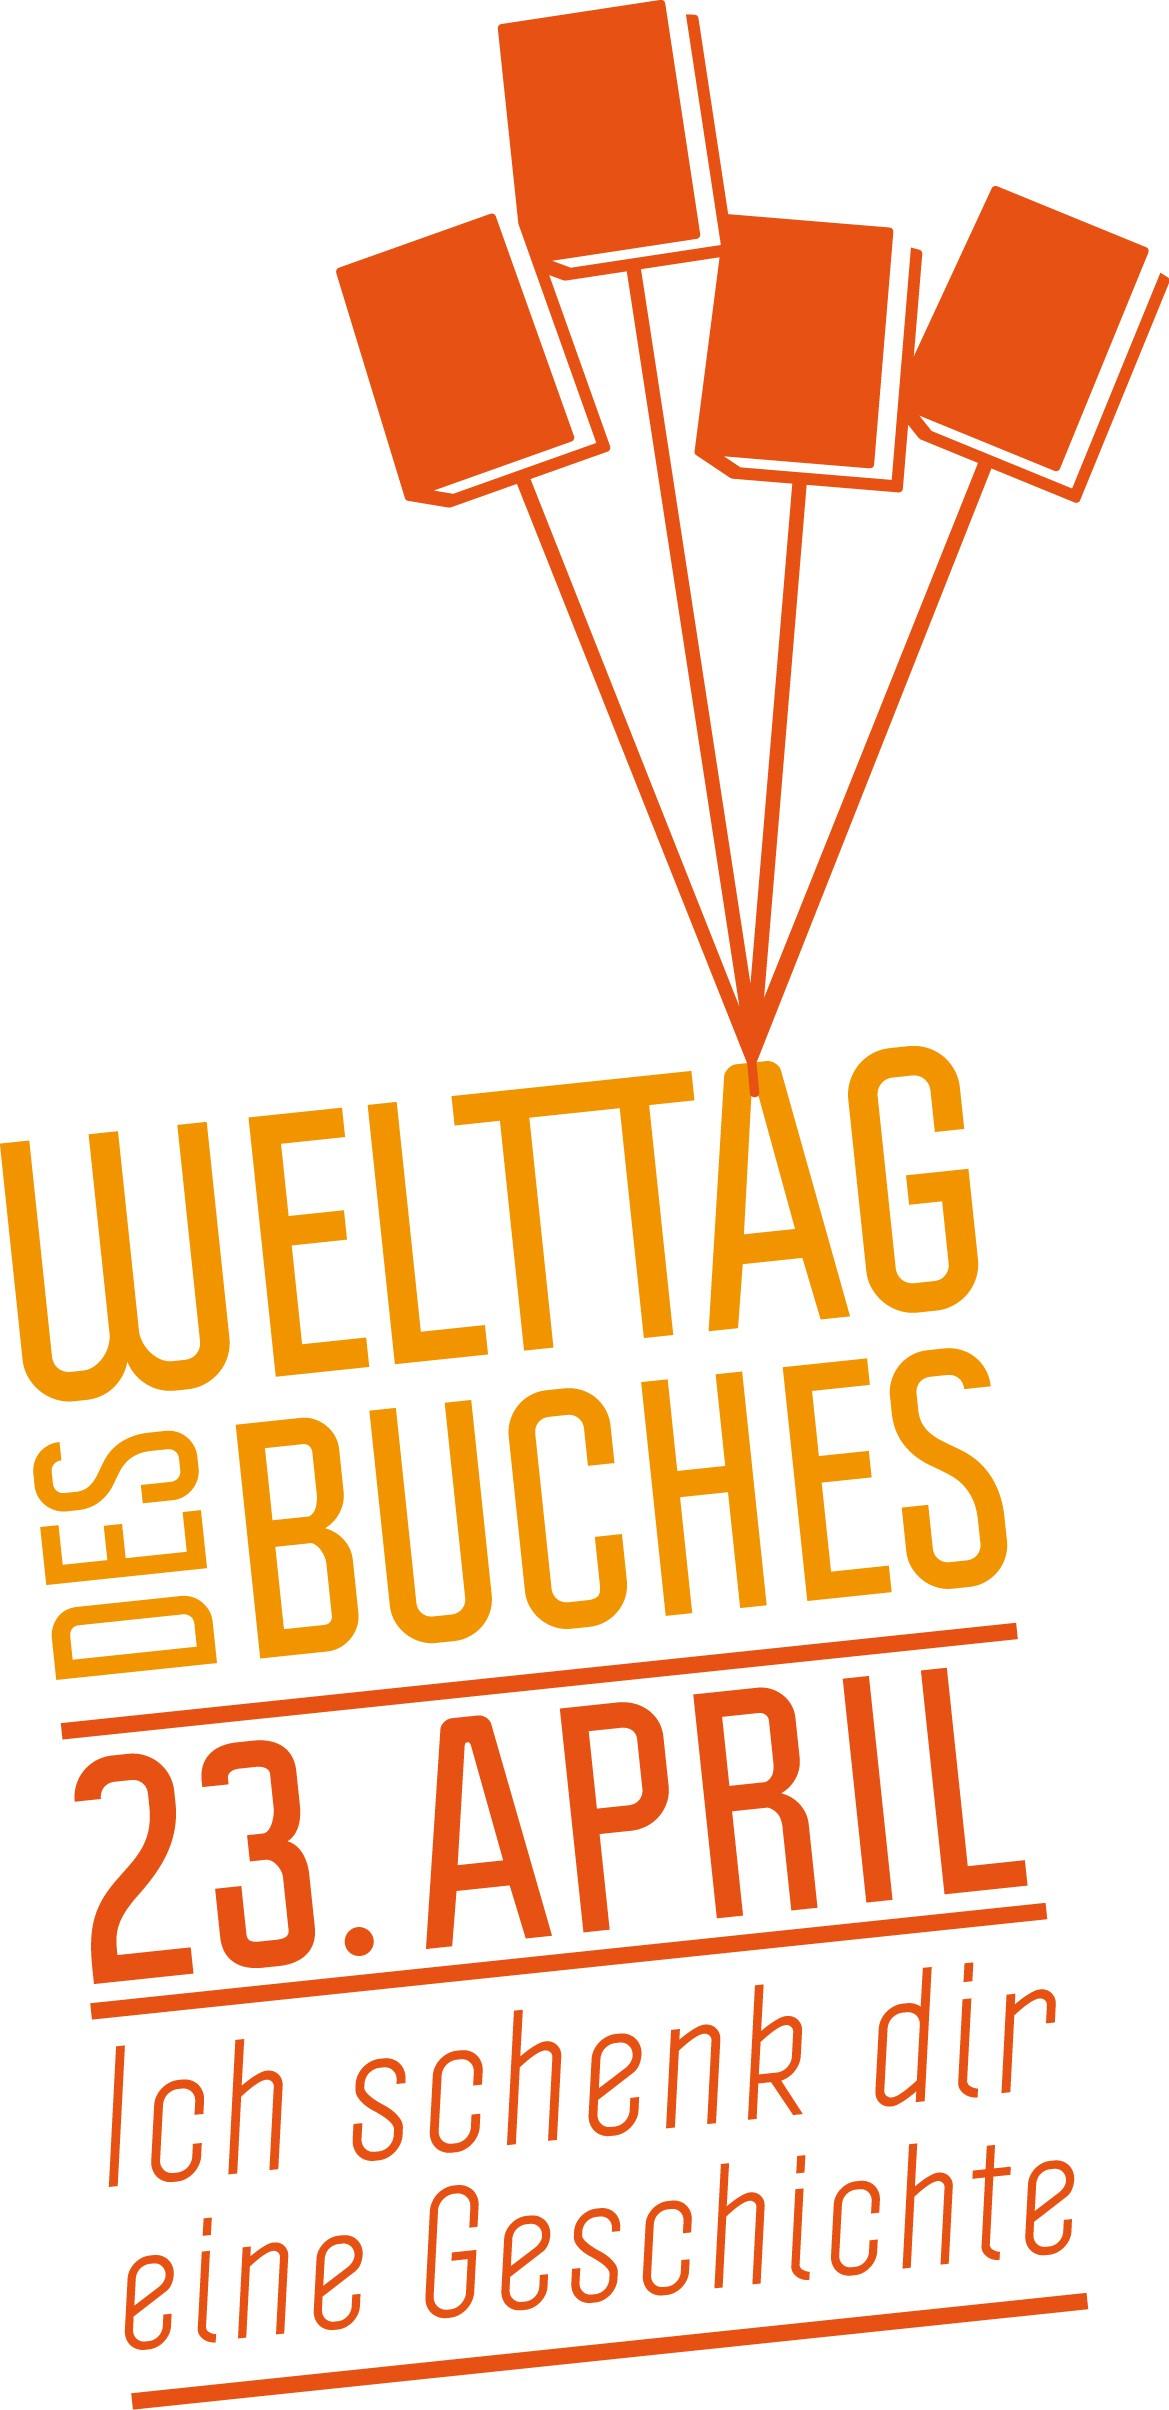 https://www.welttag-des-buches.de/fileadmin/user_upload/downloads/WDB2014_Geschichte_claim_23APRIL.jpg